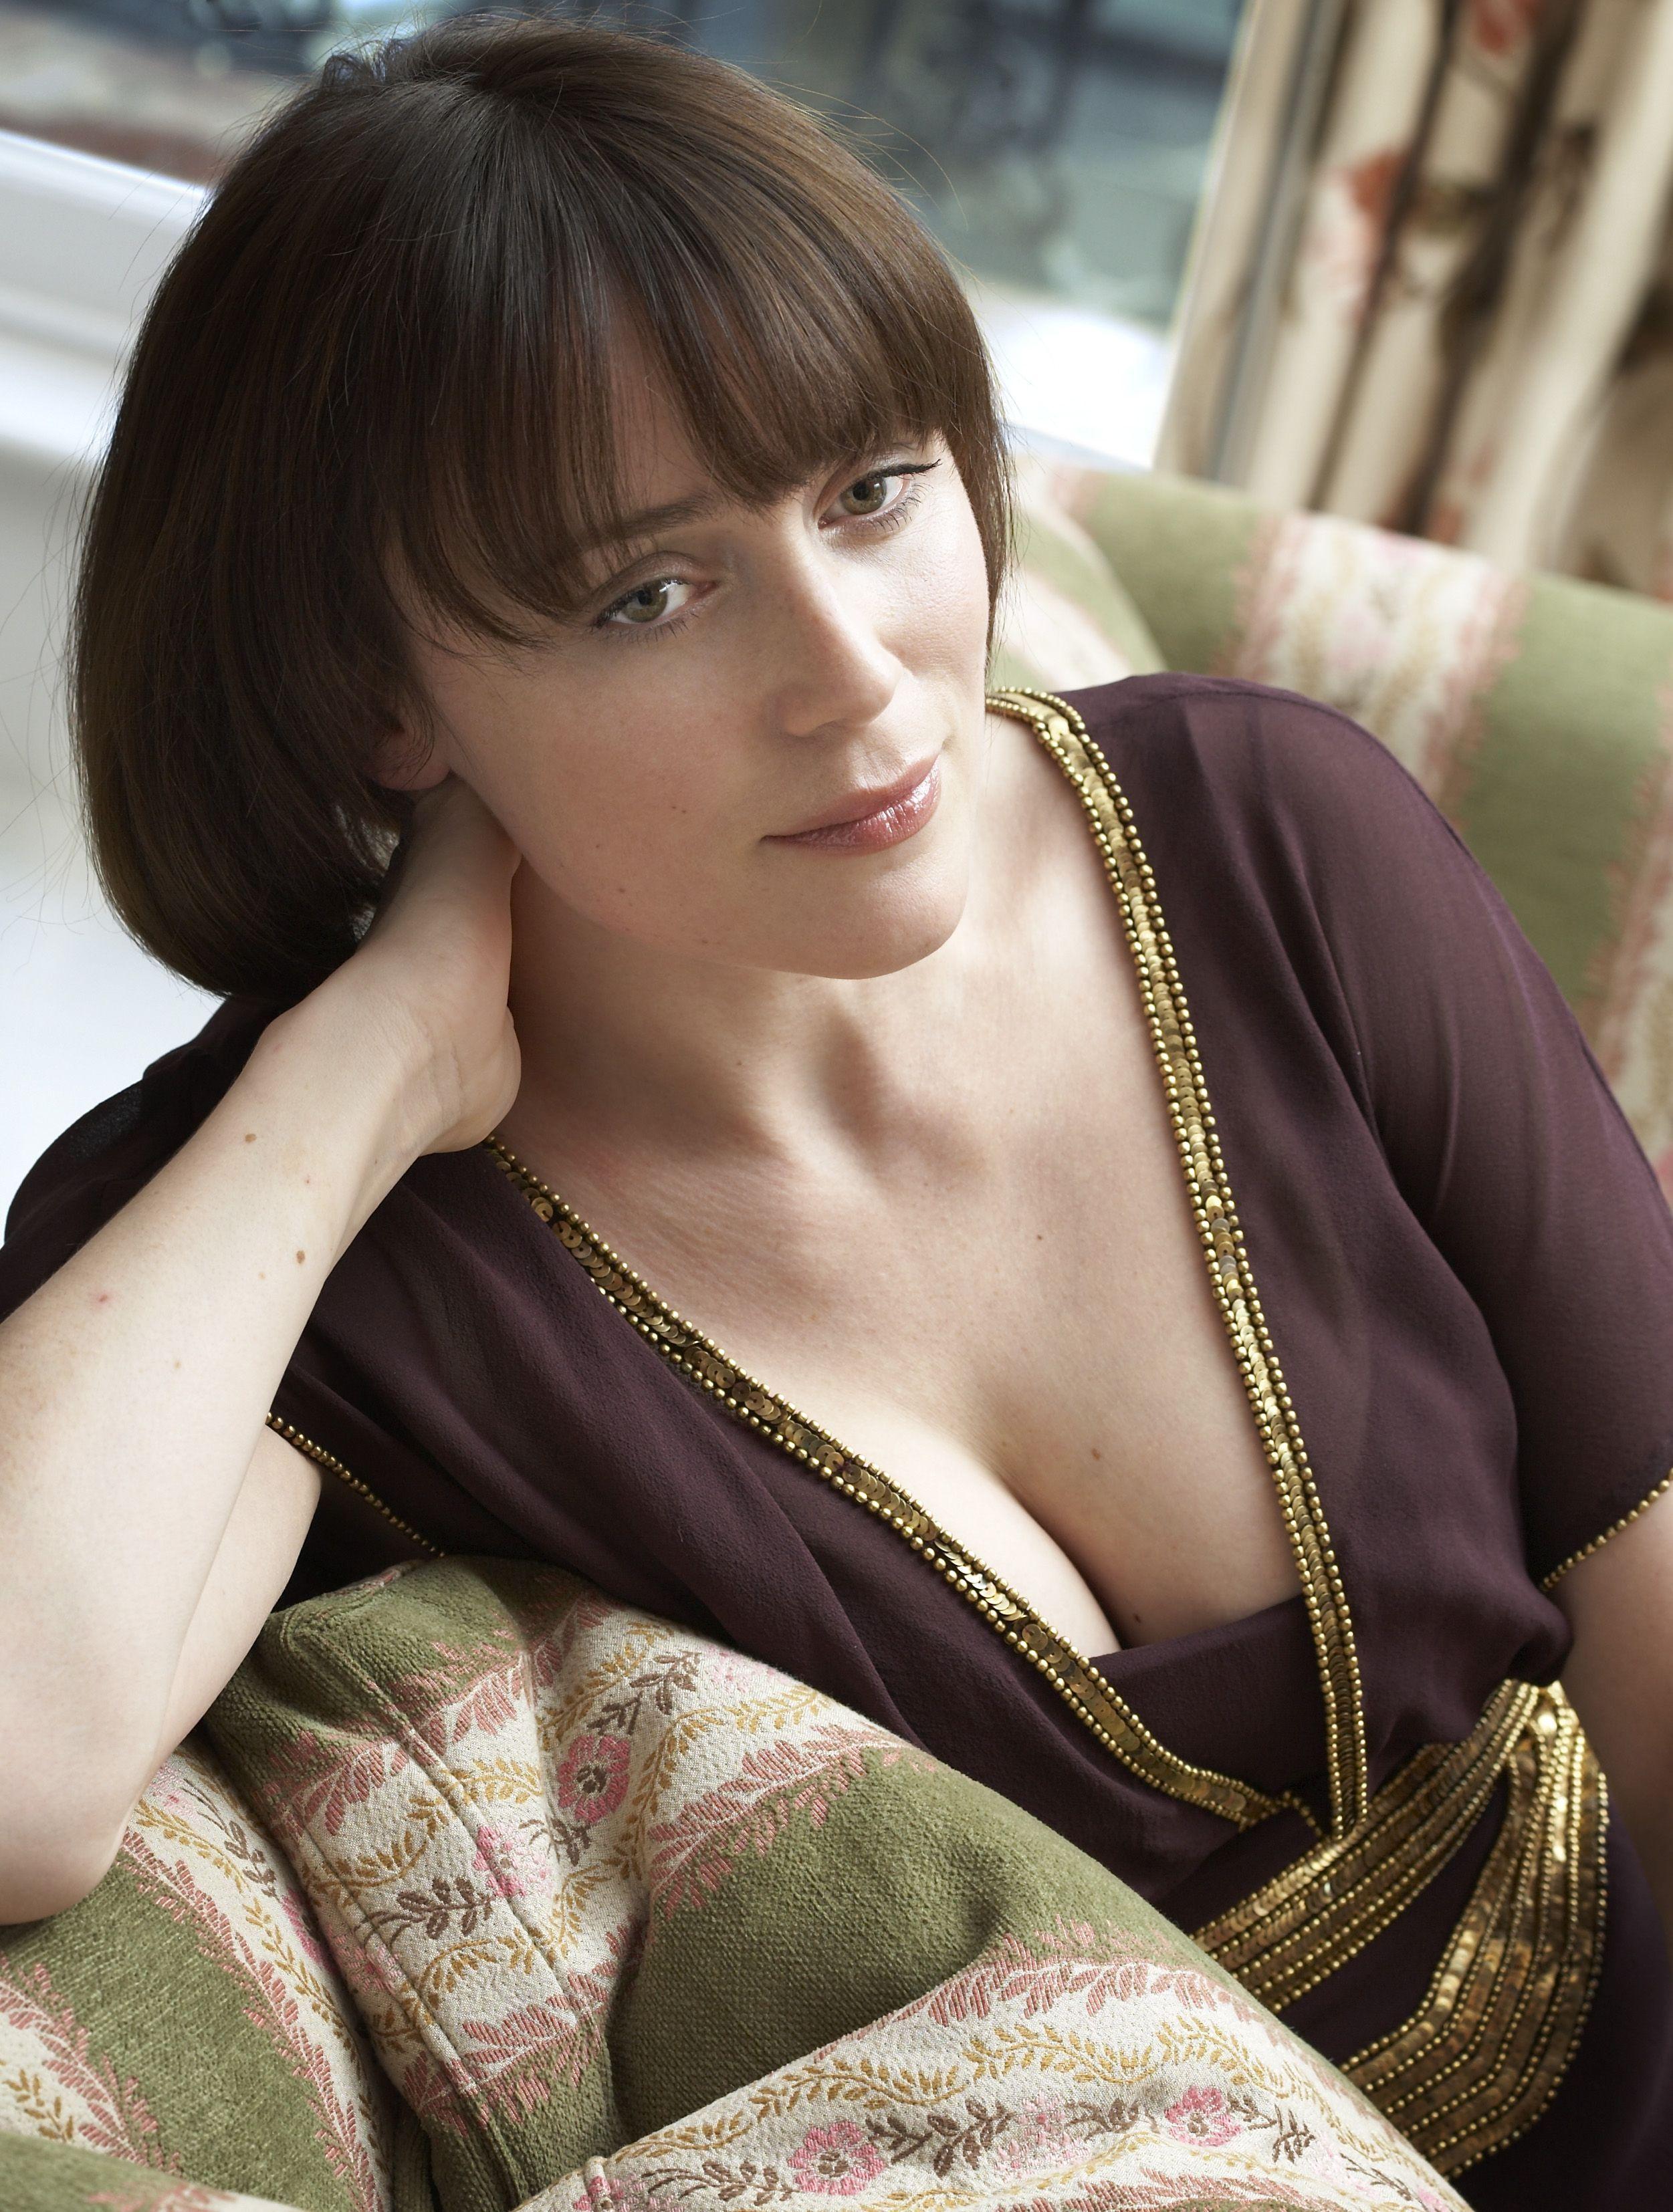 Forum on this topic: Michelle Belegrin, fiona-mollison-born-1954/